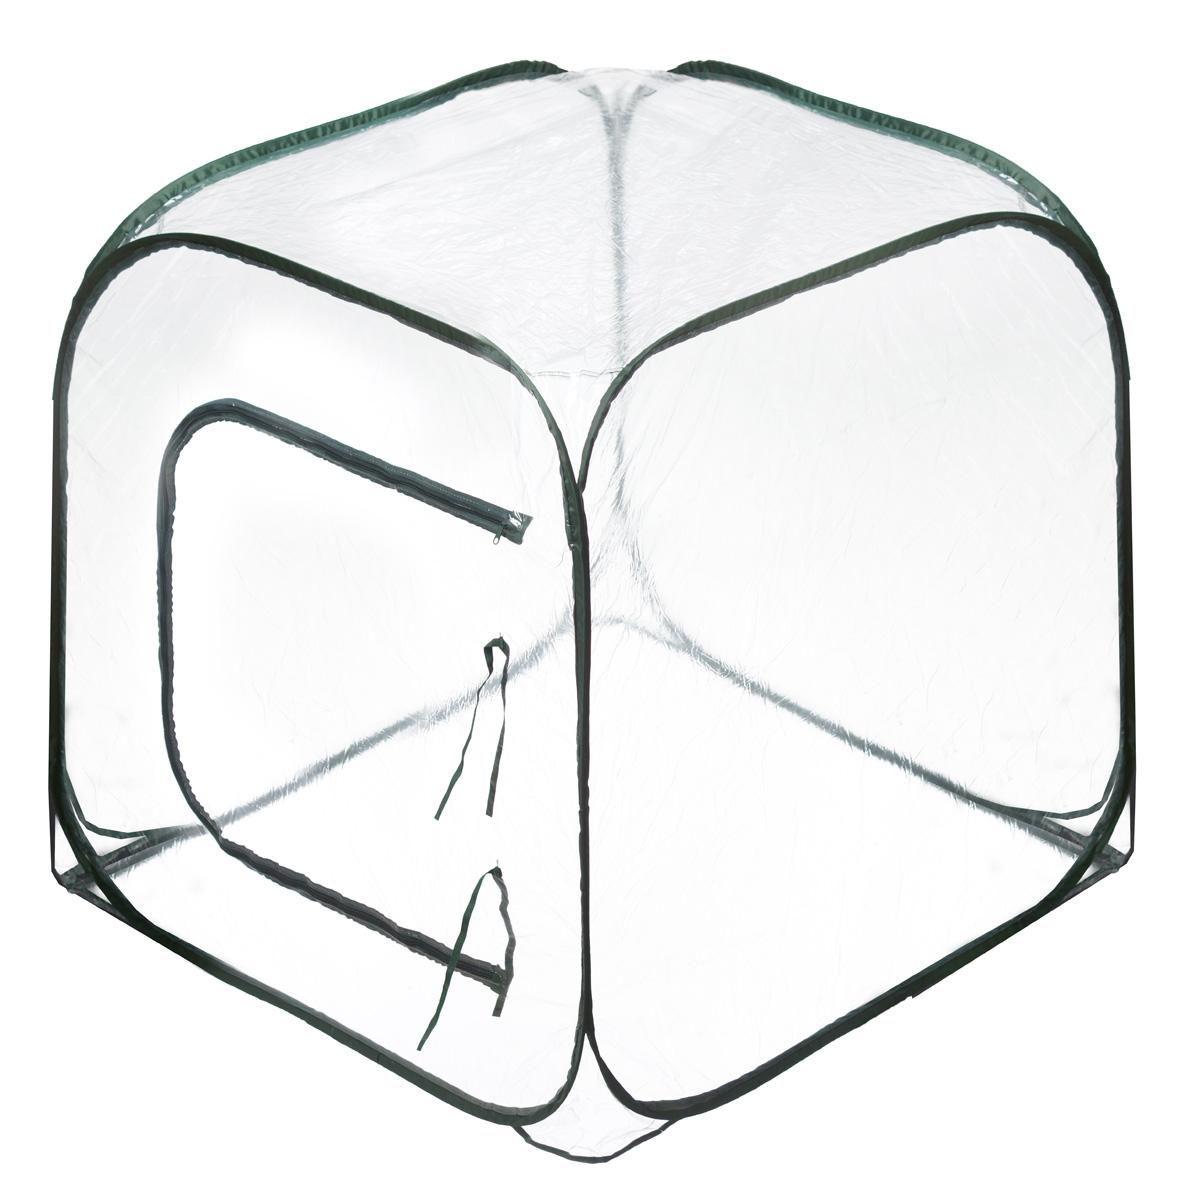 Мини-теплица Green Apple, 105 x 105 x 105 см штуцерный тройник для шланга green apple gwhc20 062